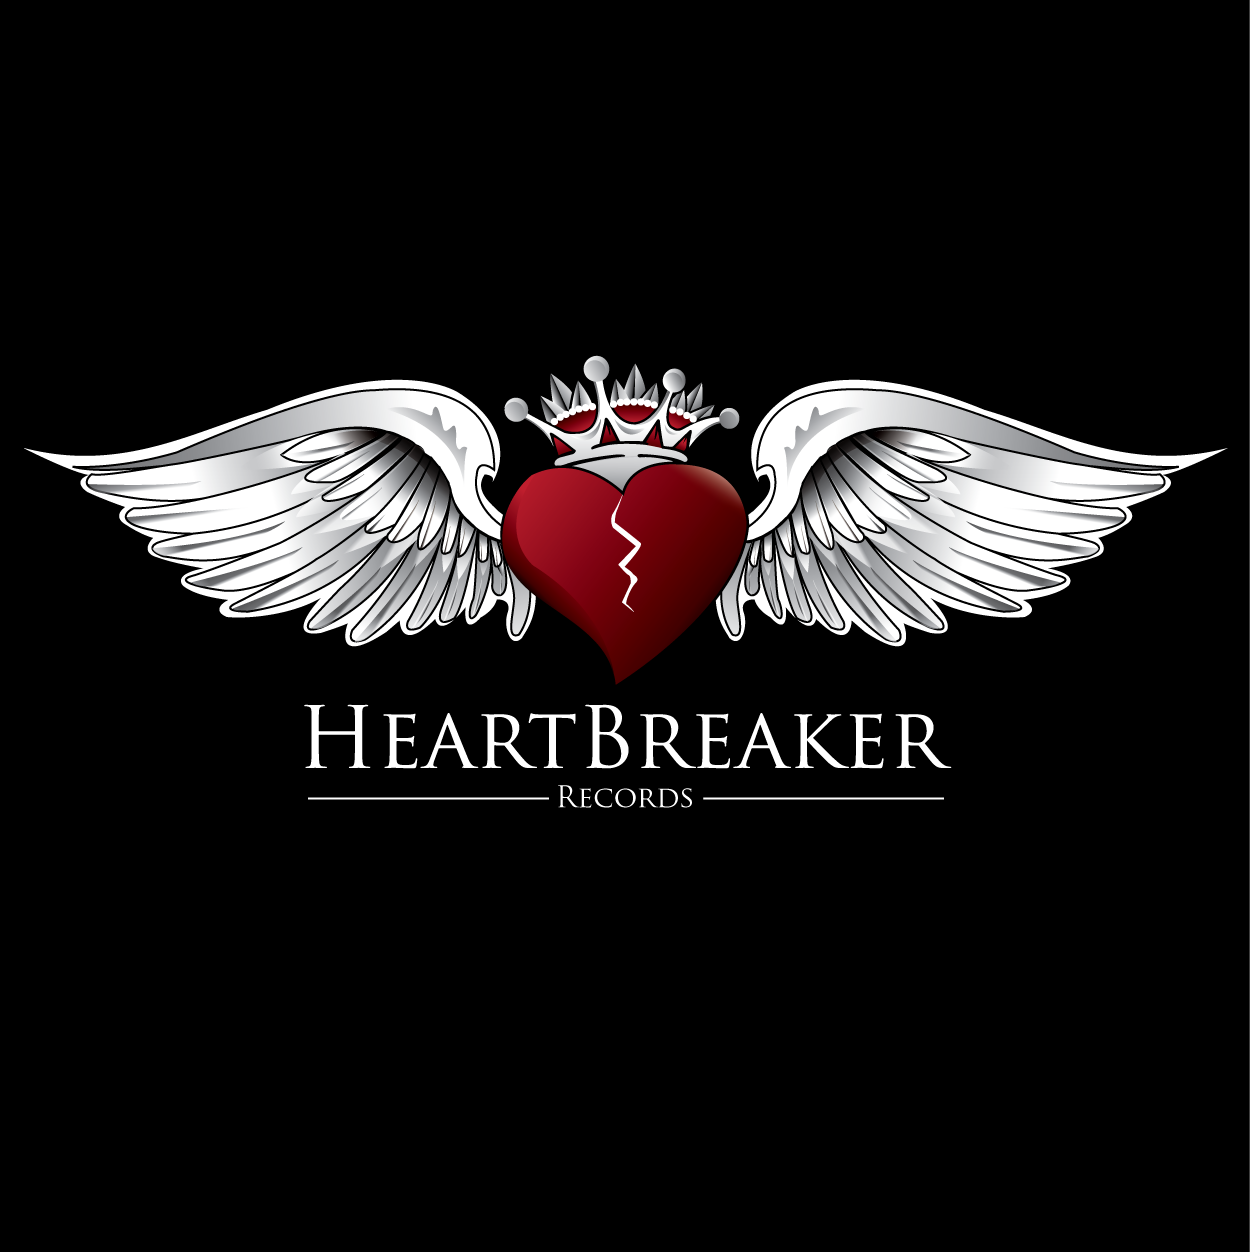 Logo Design by trabas - Entry No. 65 in the Logo Design Contest Heartbreaker Records.